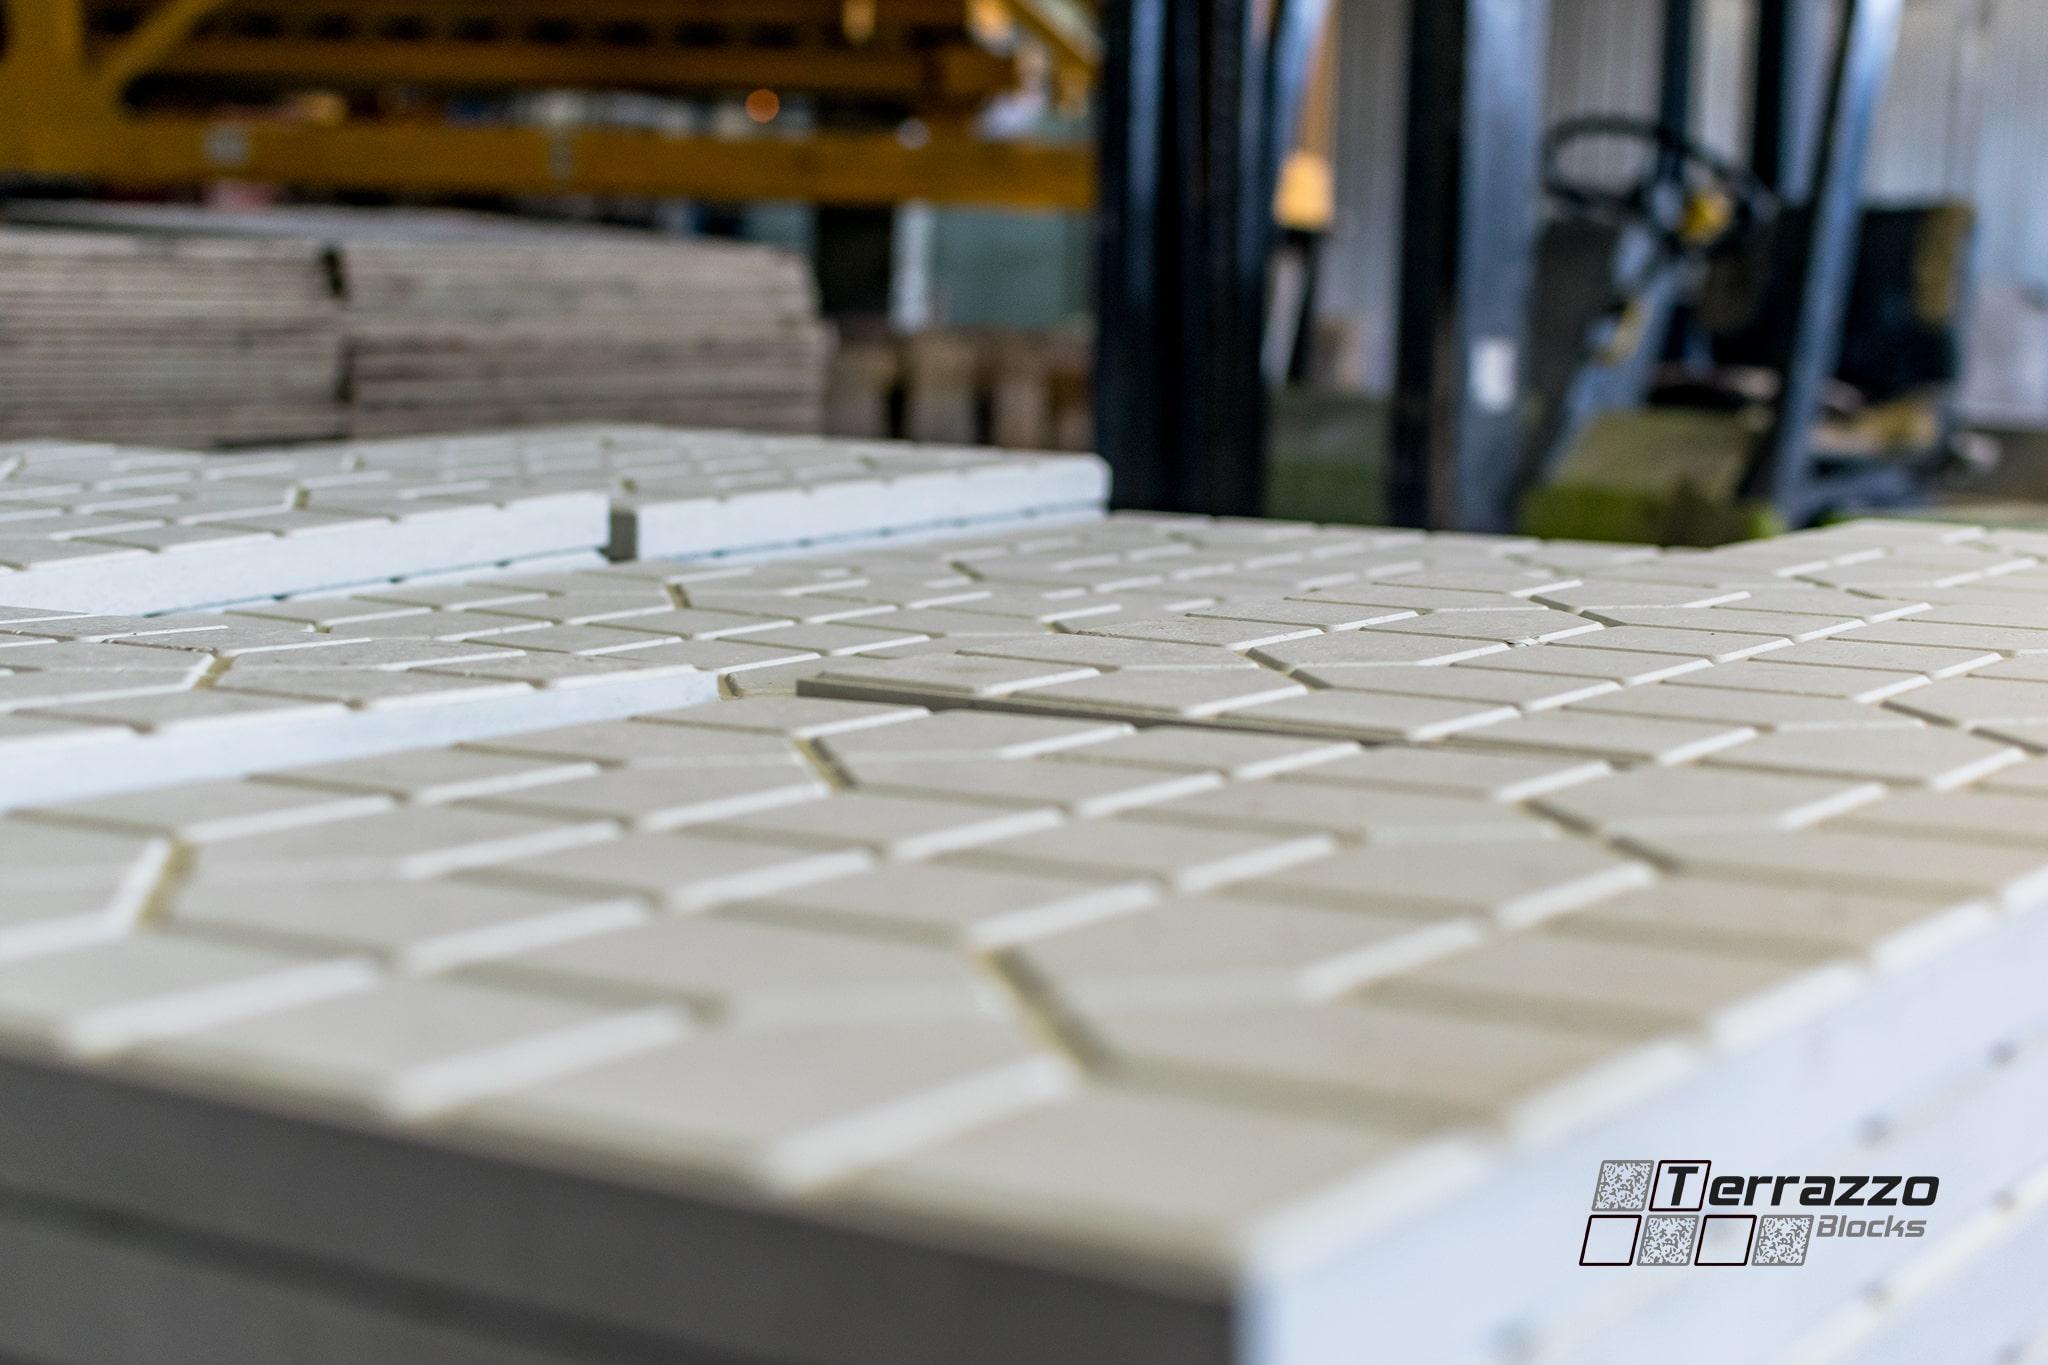 Производство терраццо - фотографии завода